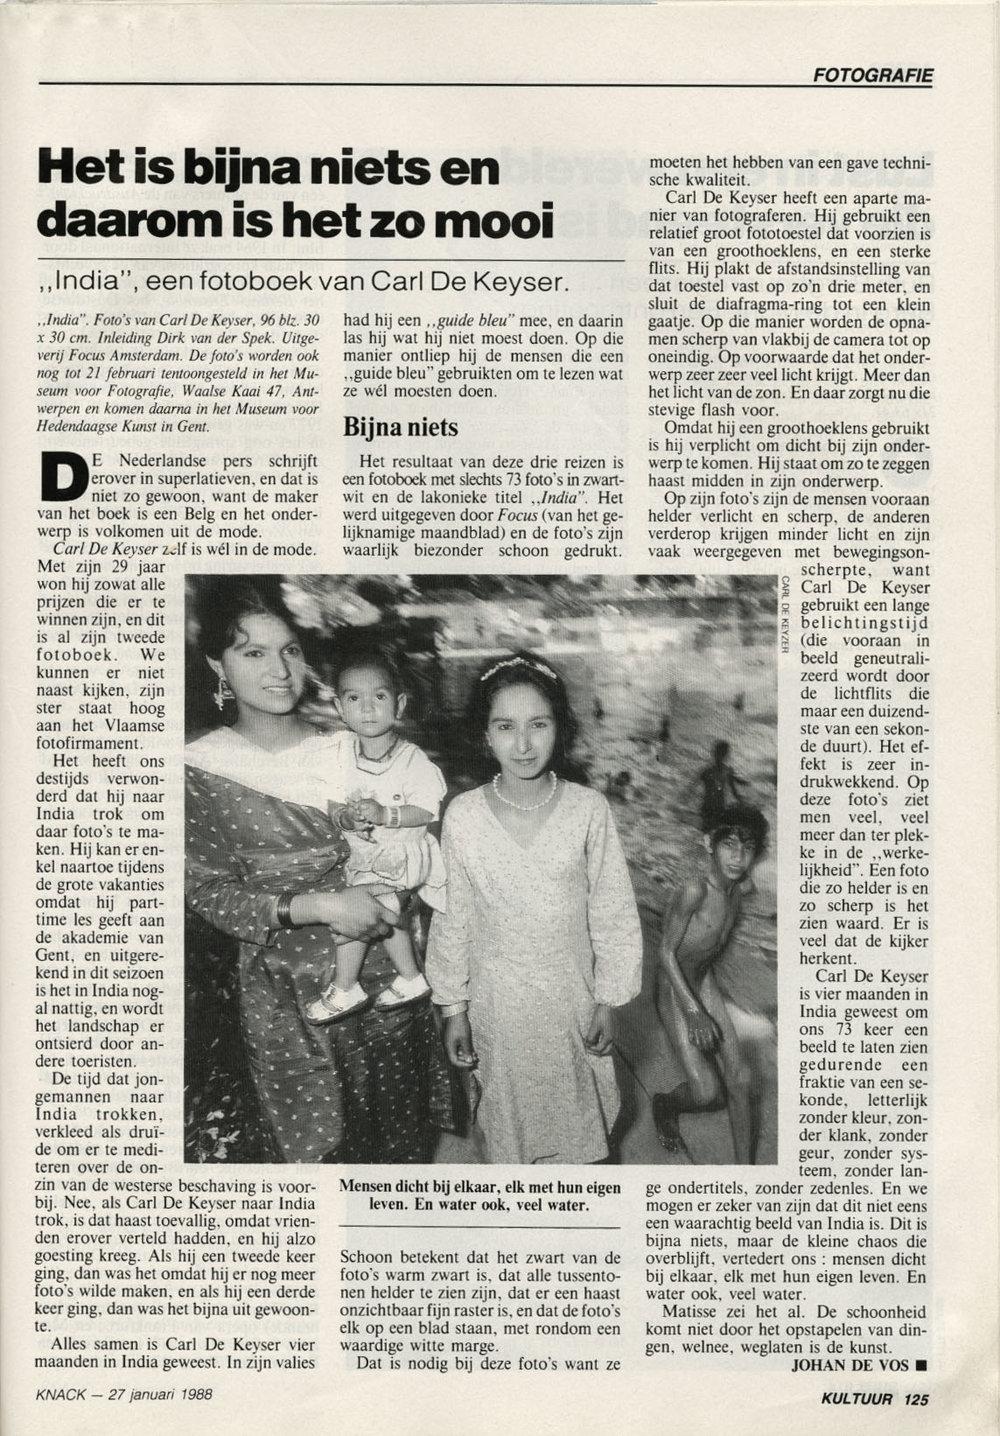 Knack (India)